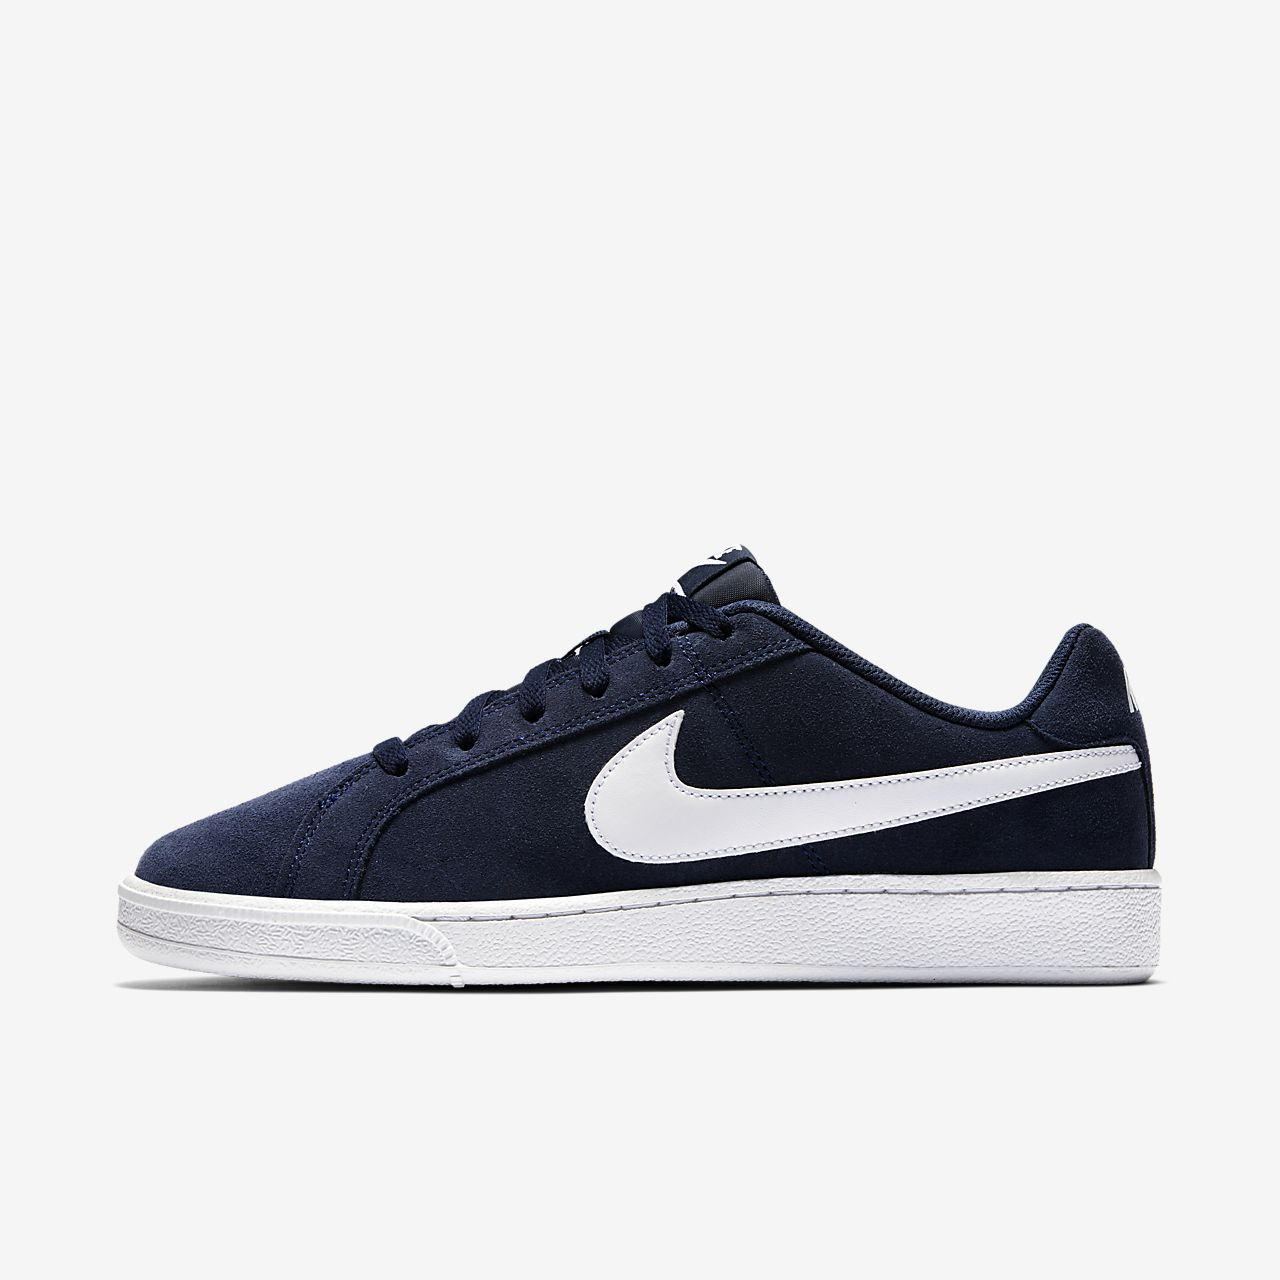 NikeCourt Royale Men's Tennis Shoe